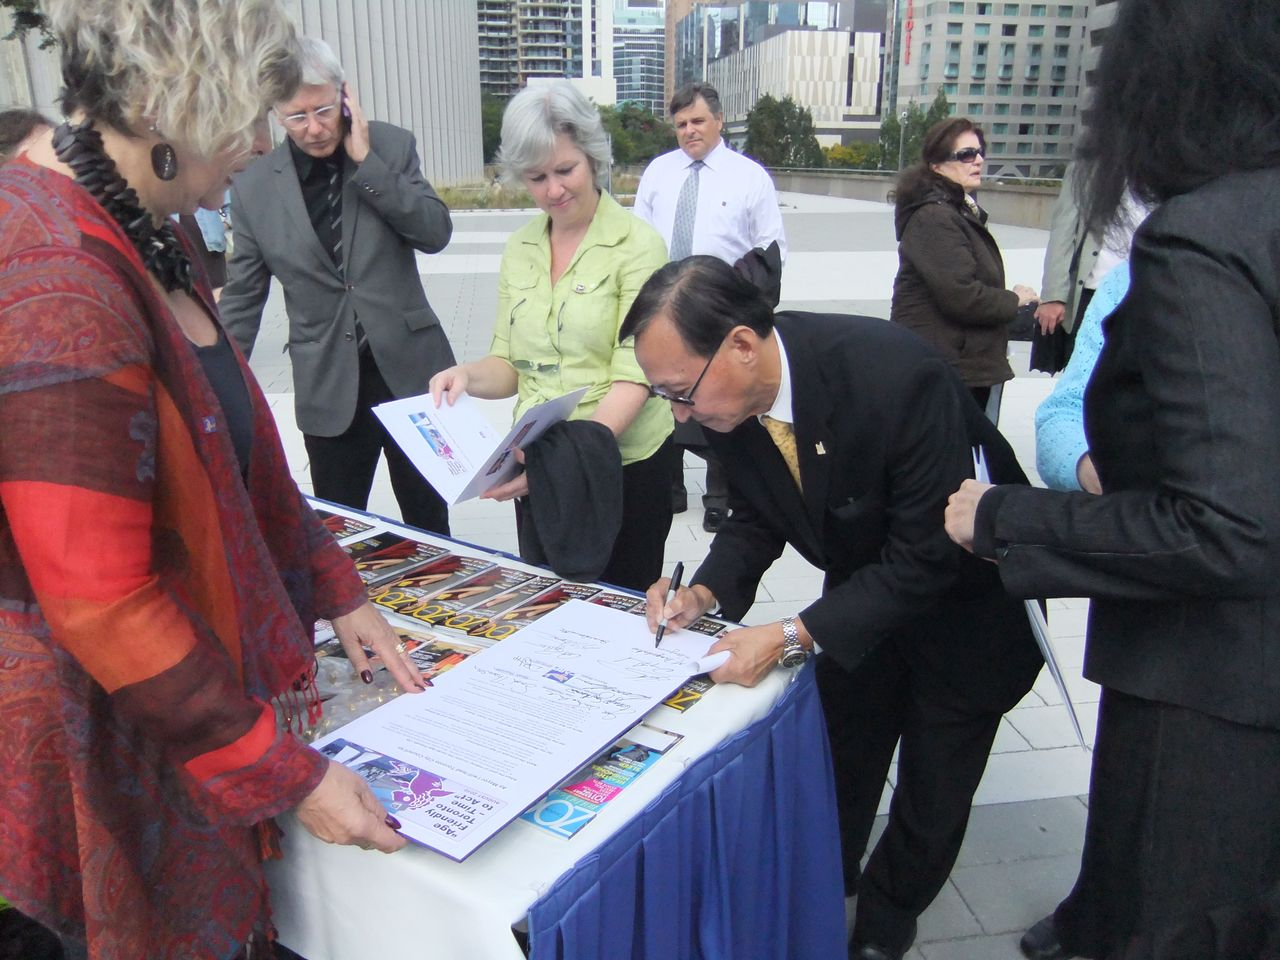 Toronto CARP Chapter Chair Adina Lebo looks on as Toronto City Councillor Raymond Cho signs the pledge